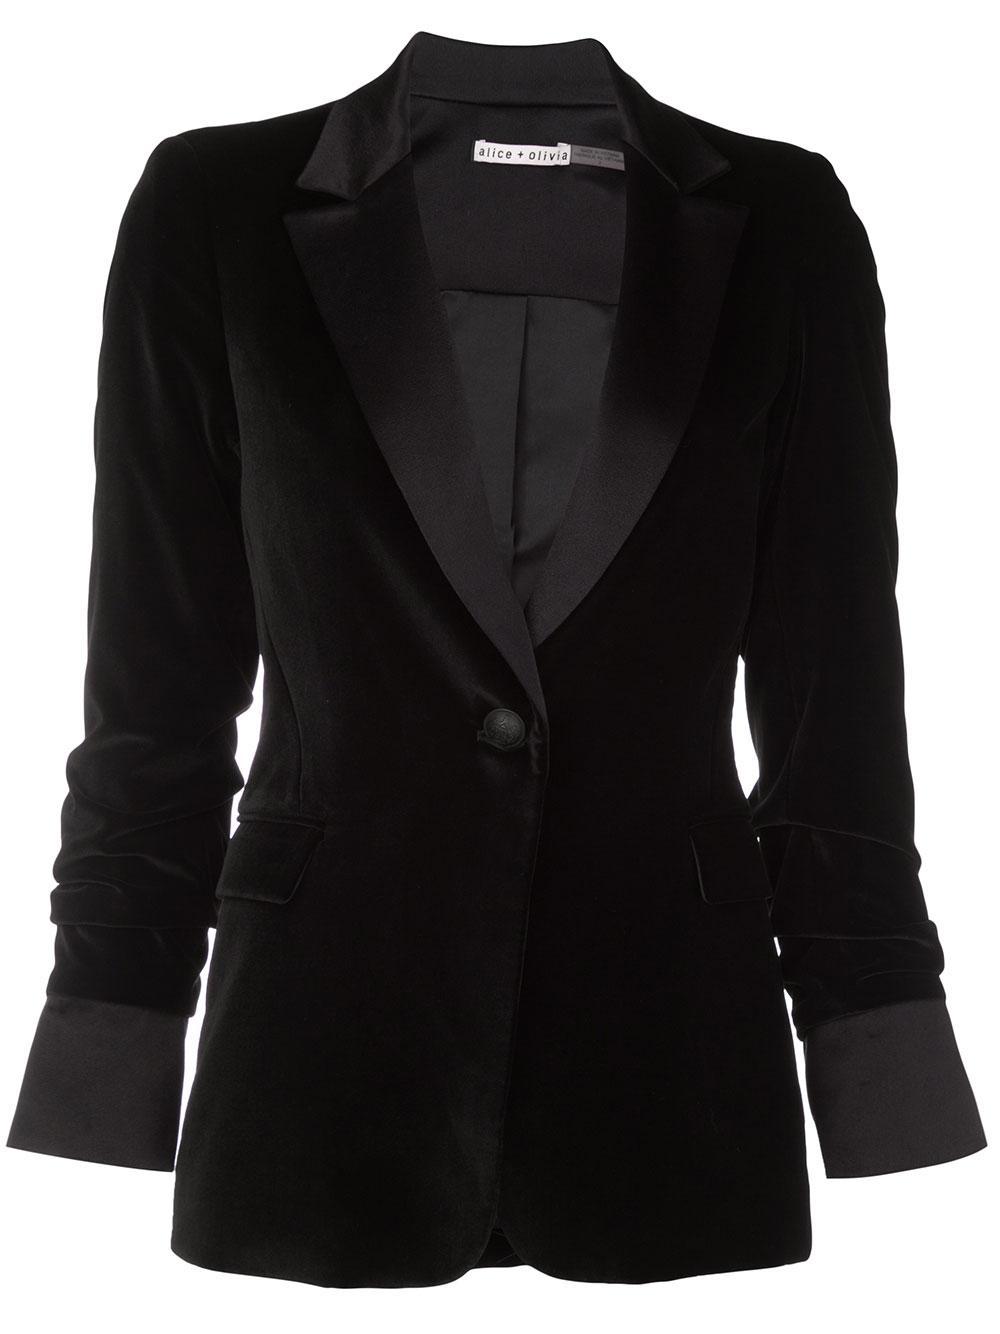 Macey Pleated Sleeve Fitted Blazer Item # CC910B69204